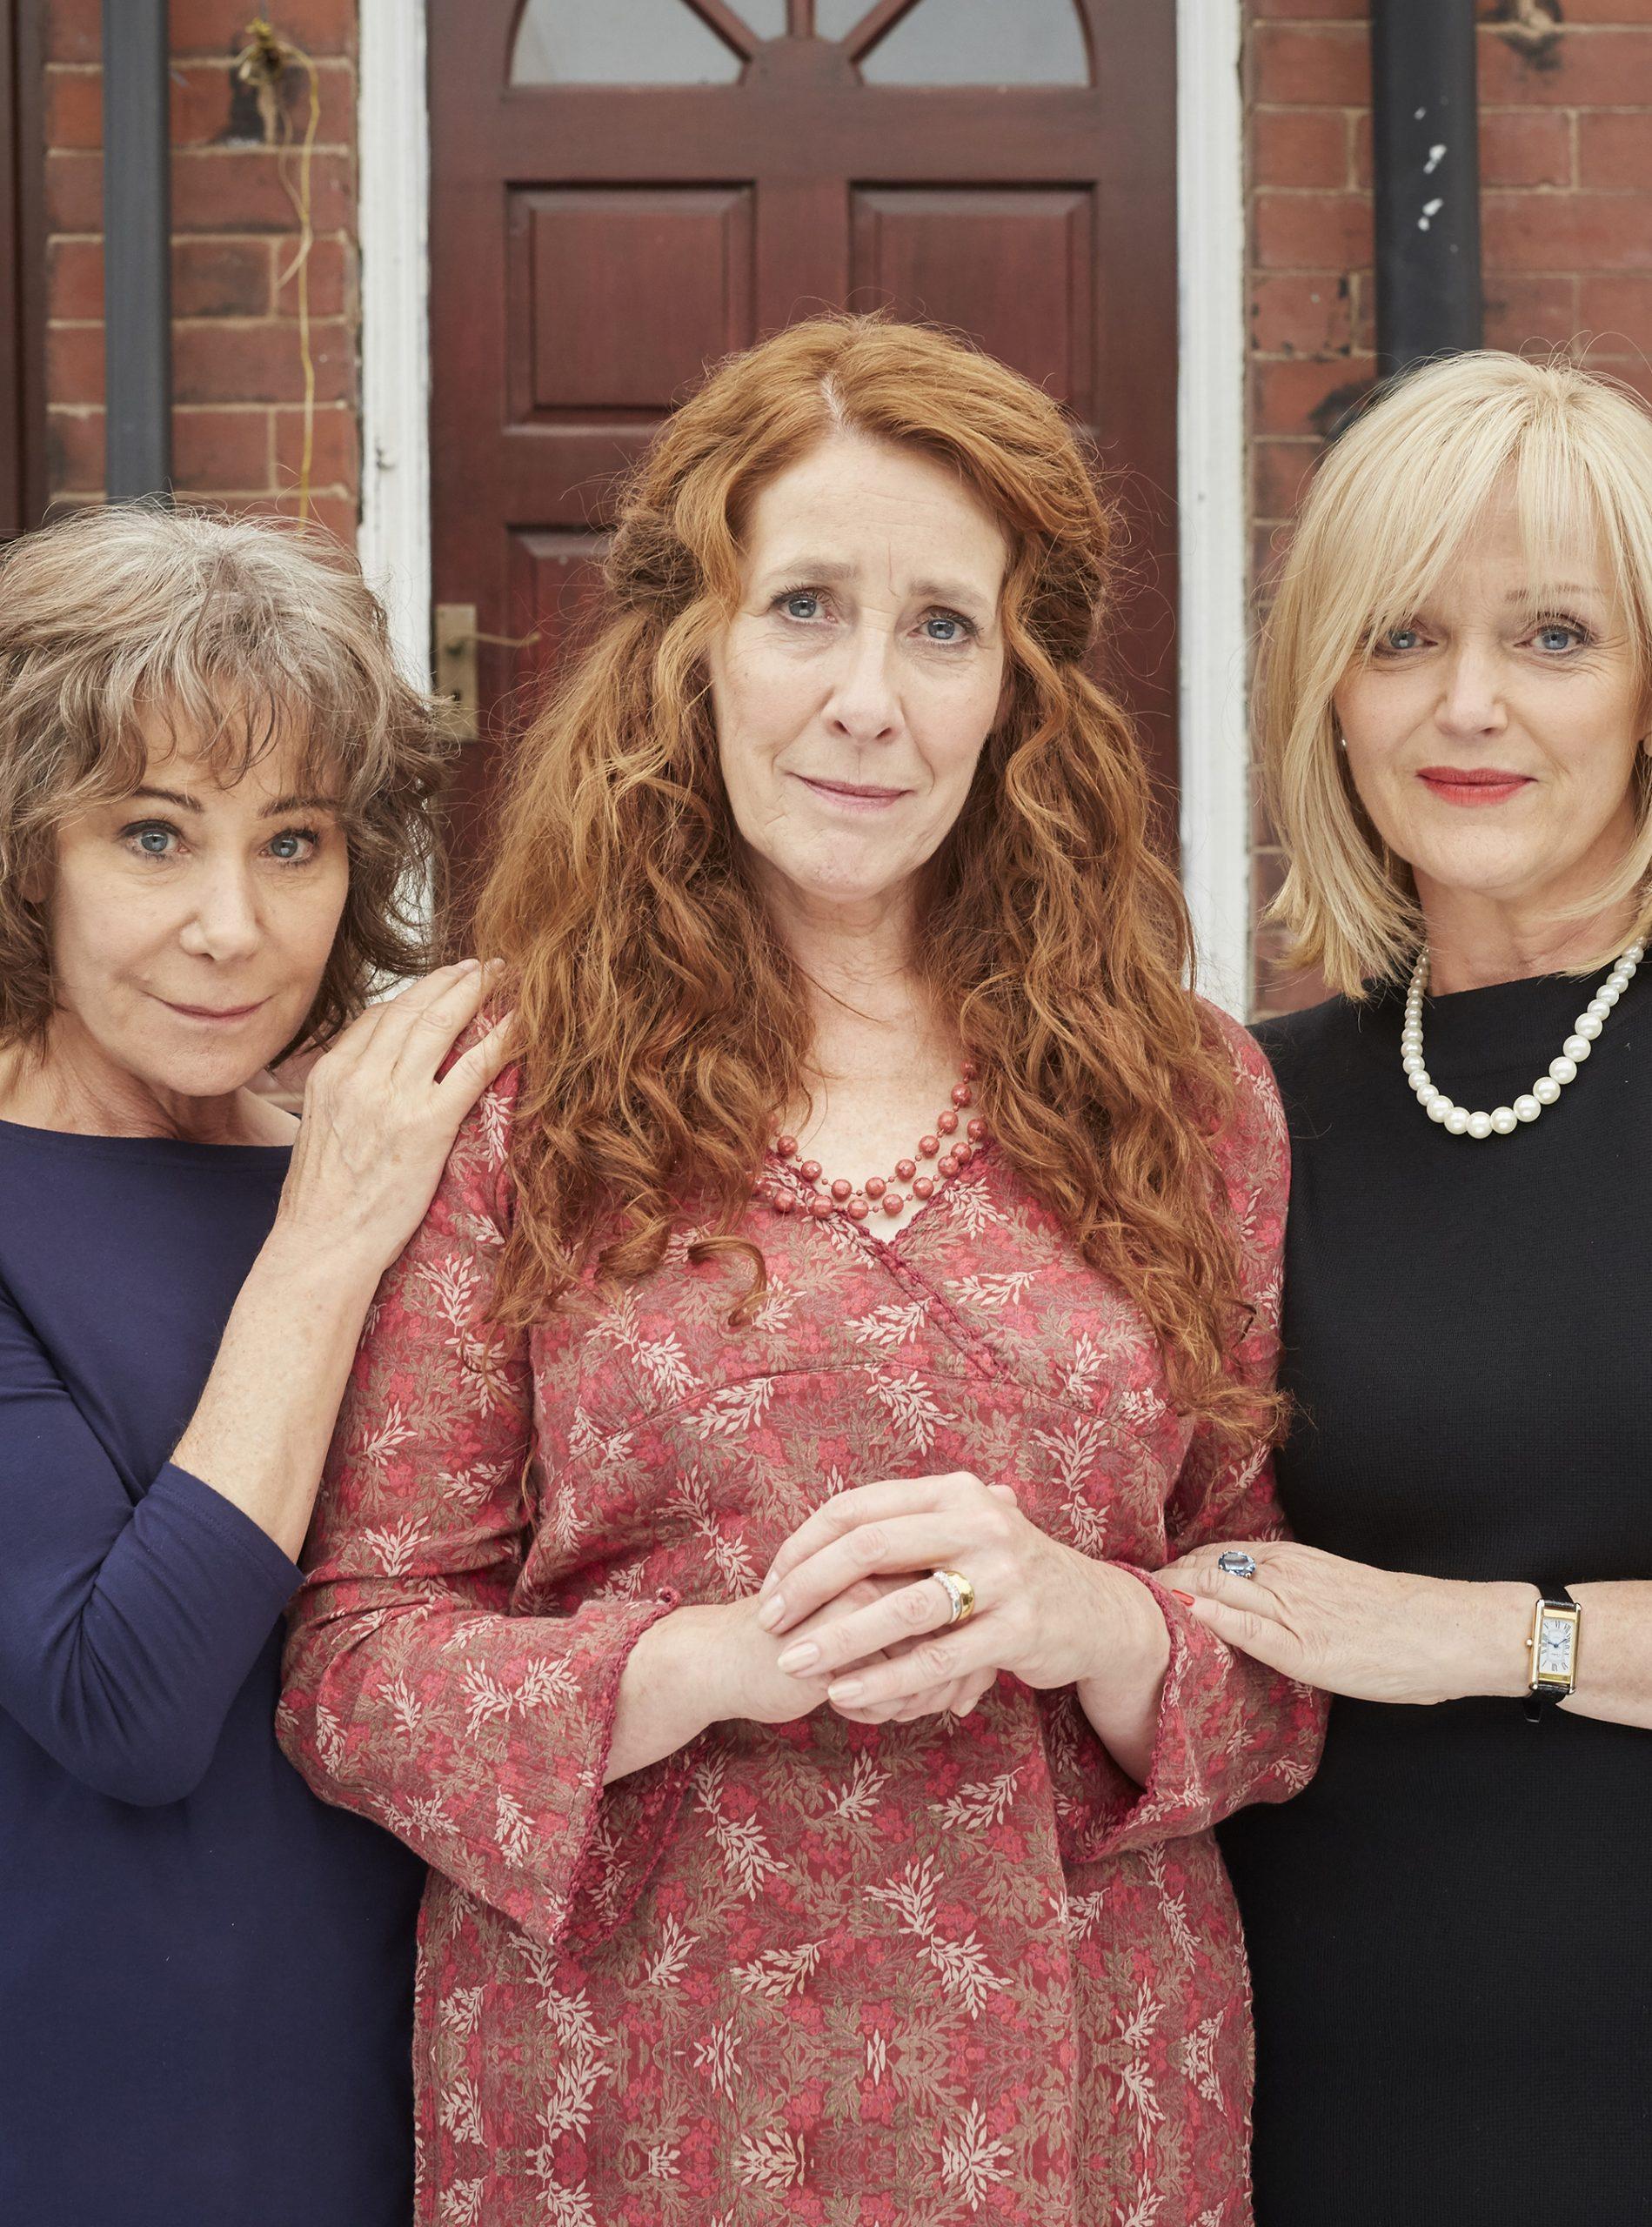 Girlfriends on ITV